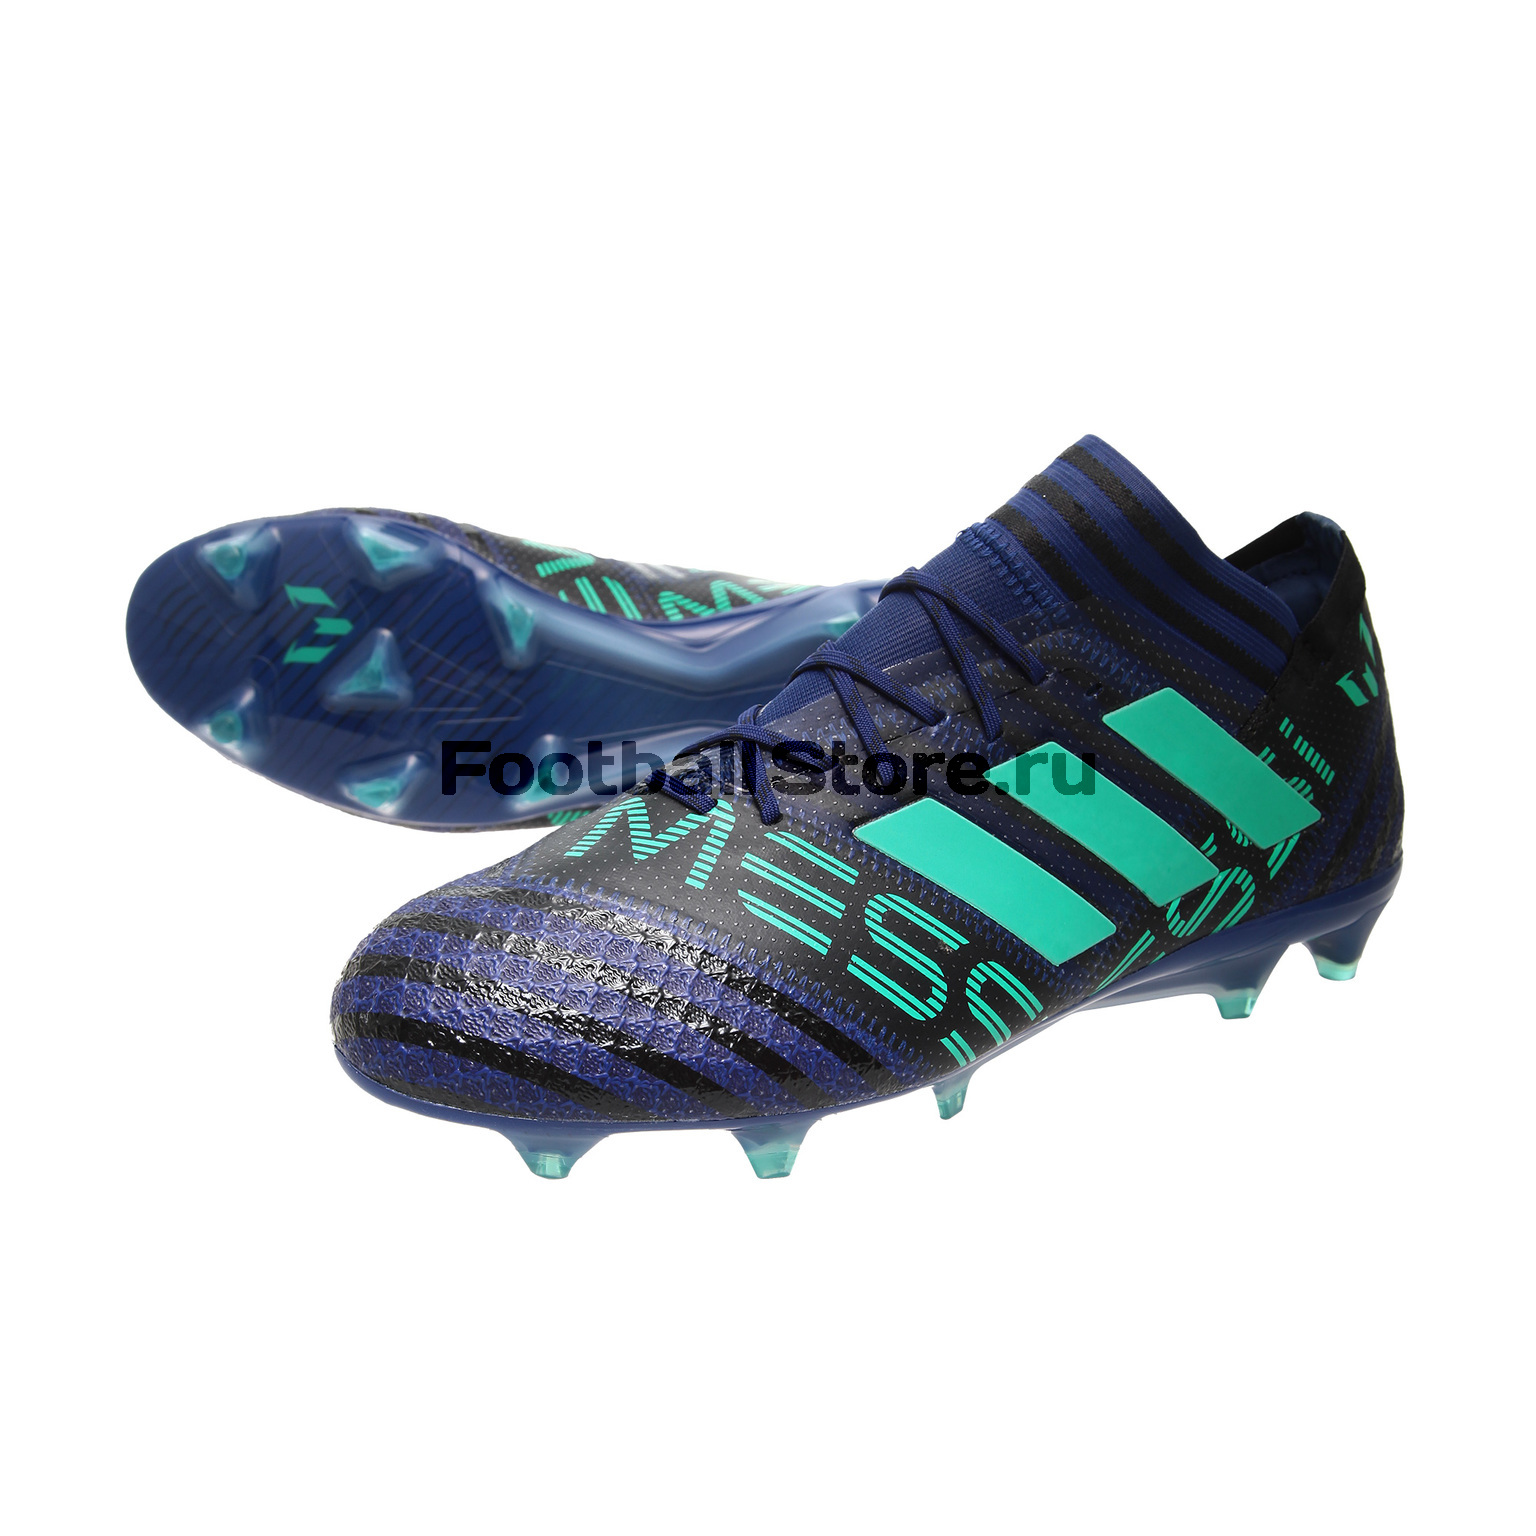 Бутсы Adidas Nemeziz Messi 17.1 FG CP9029 бутсы adidas messi 16 1 fg jr bb3852